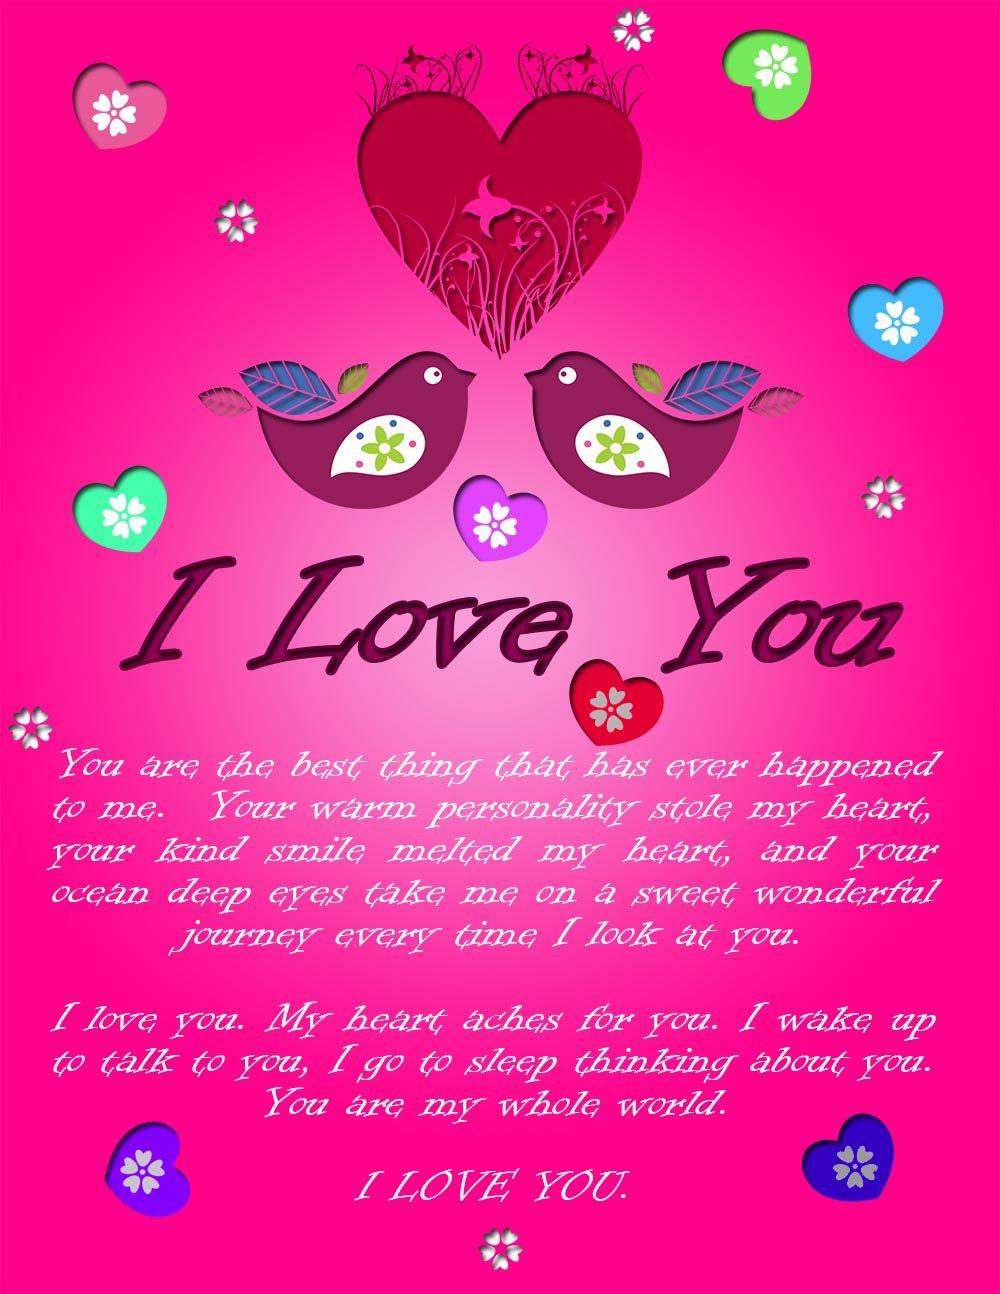 I Love You Ecards I Love You Ecards I Love You Husband My Love